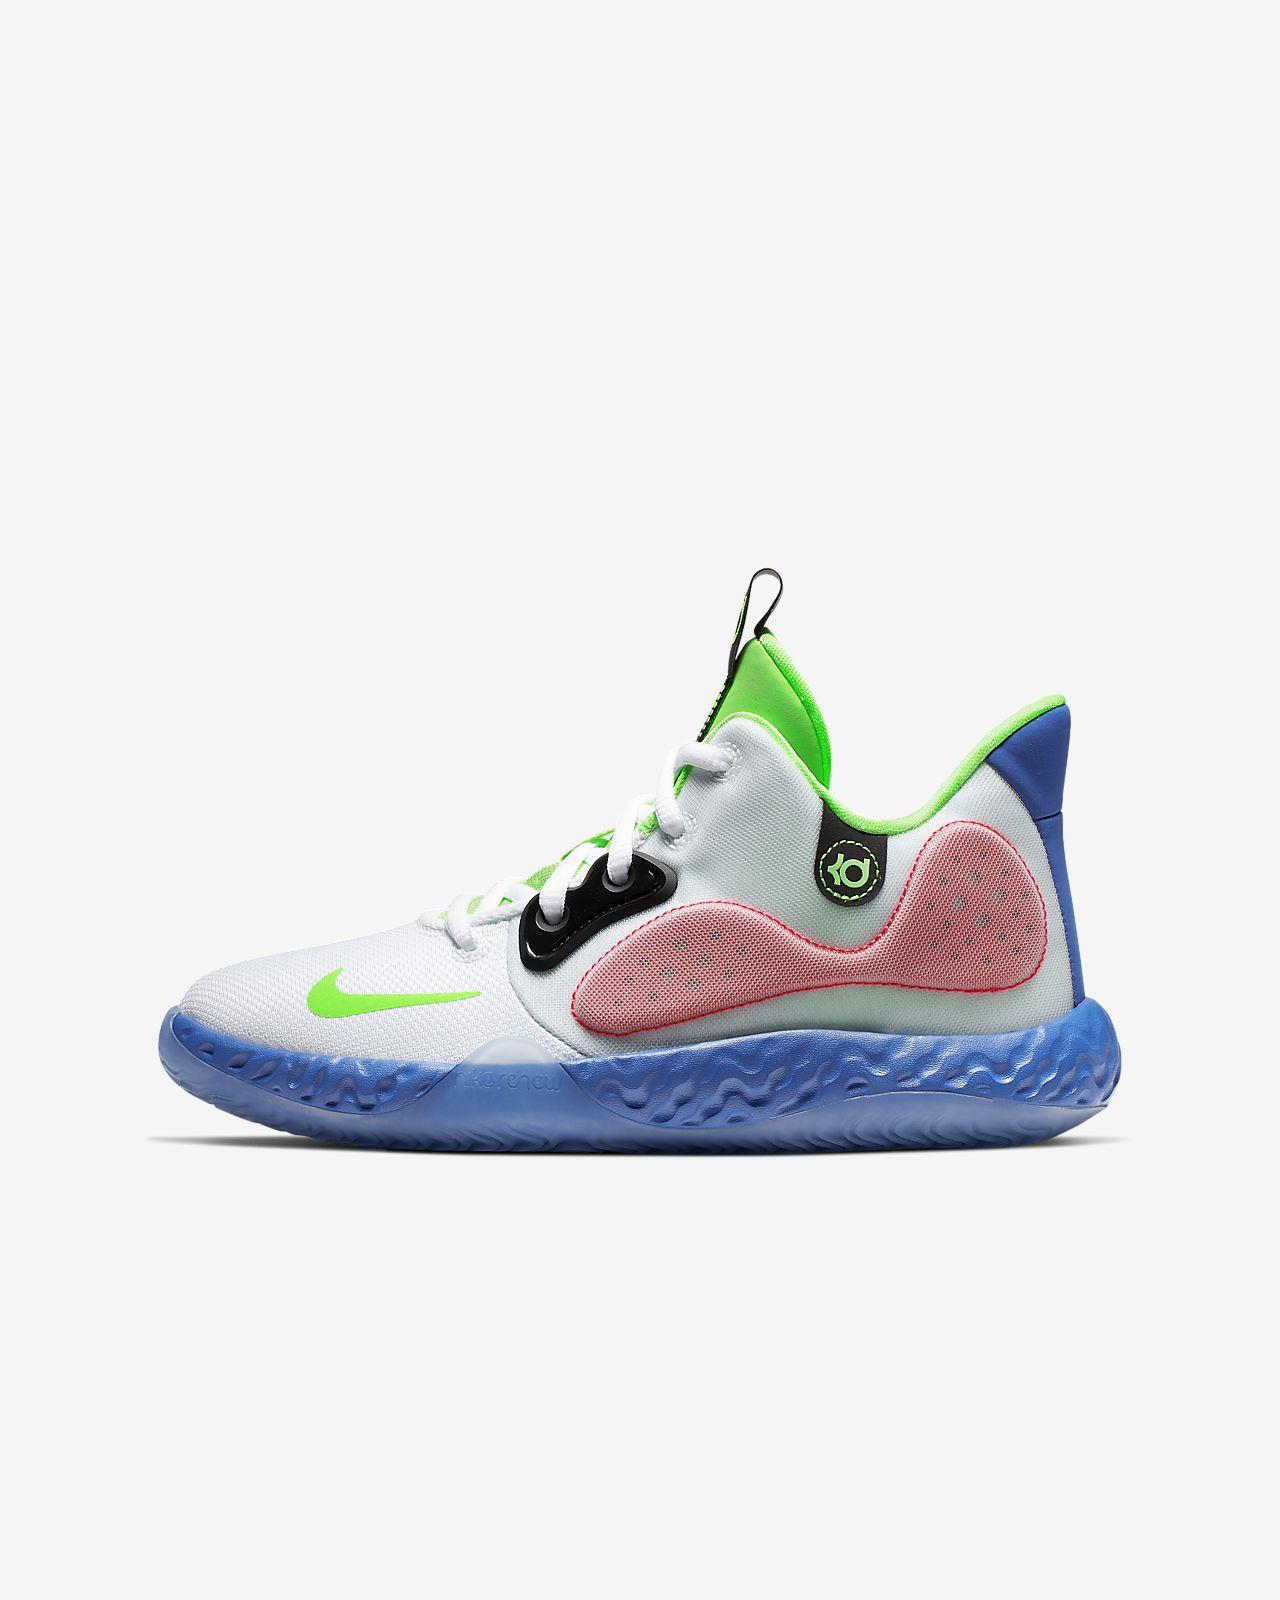 KD Trey 5 VII Big Kids' Basketball Shoe